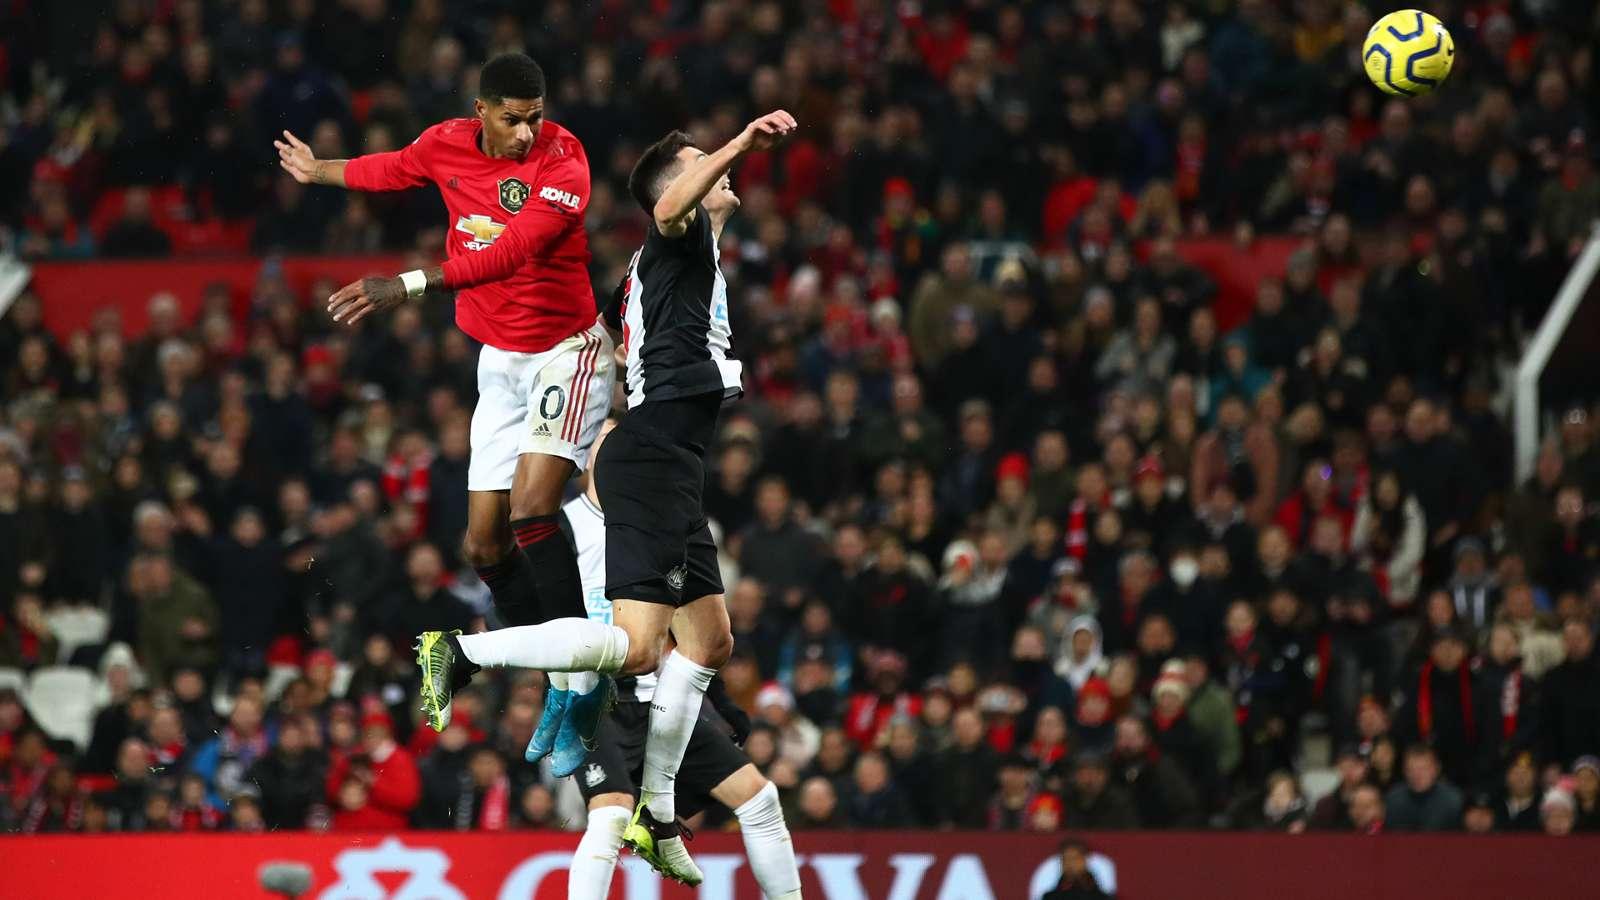 انگلیس-لیگ برتر-منچستریونایتد-نیوکاسل-Manchester United